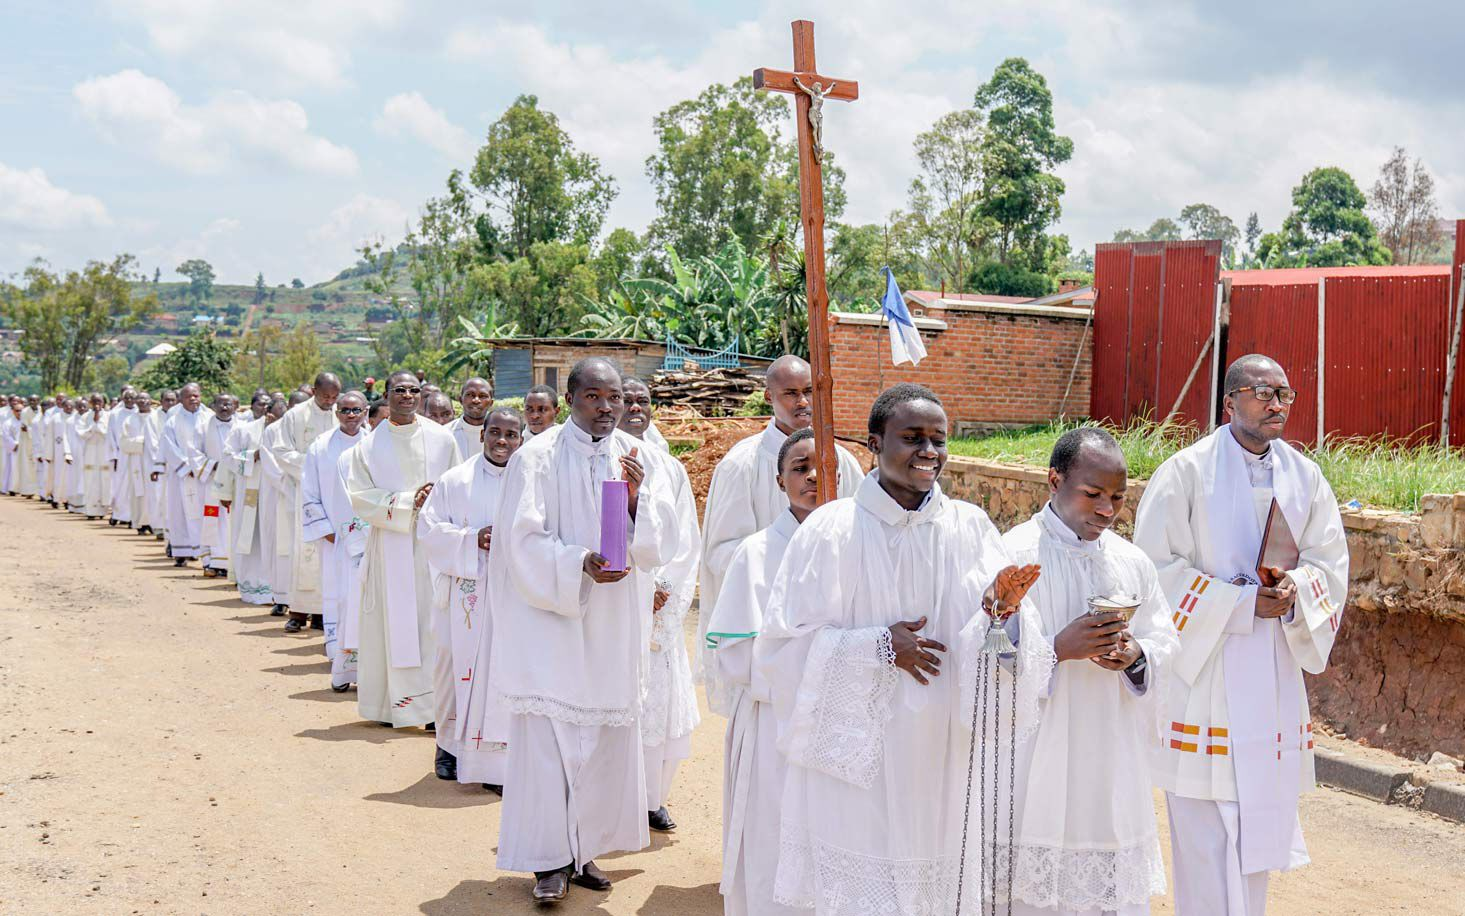 Priesterpatenschaft